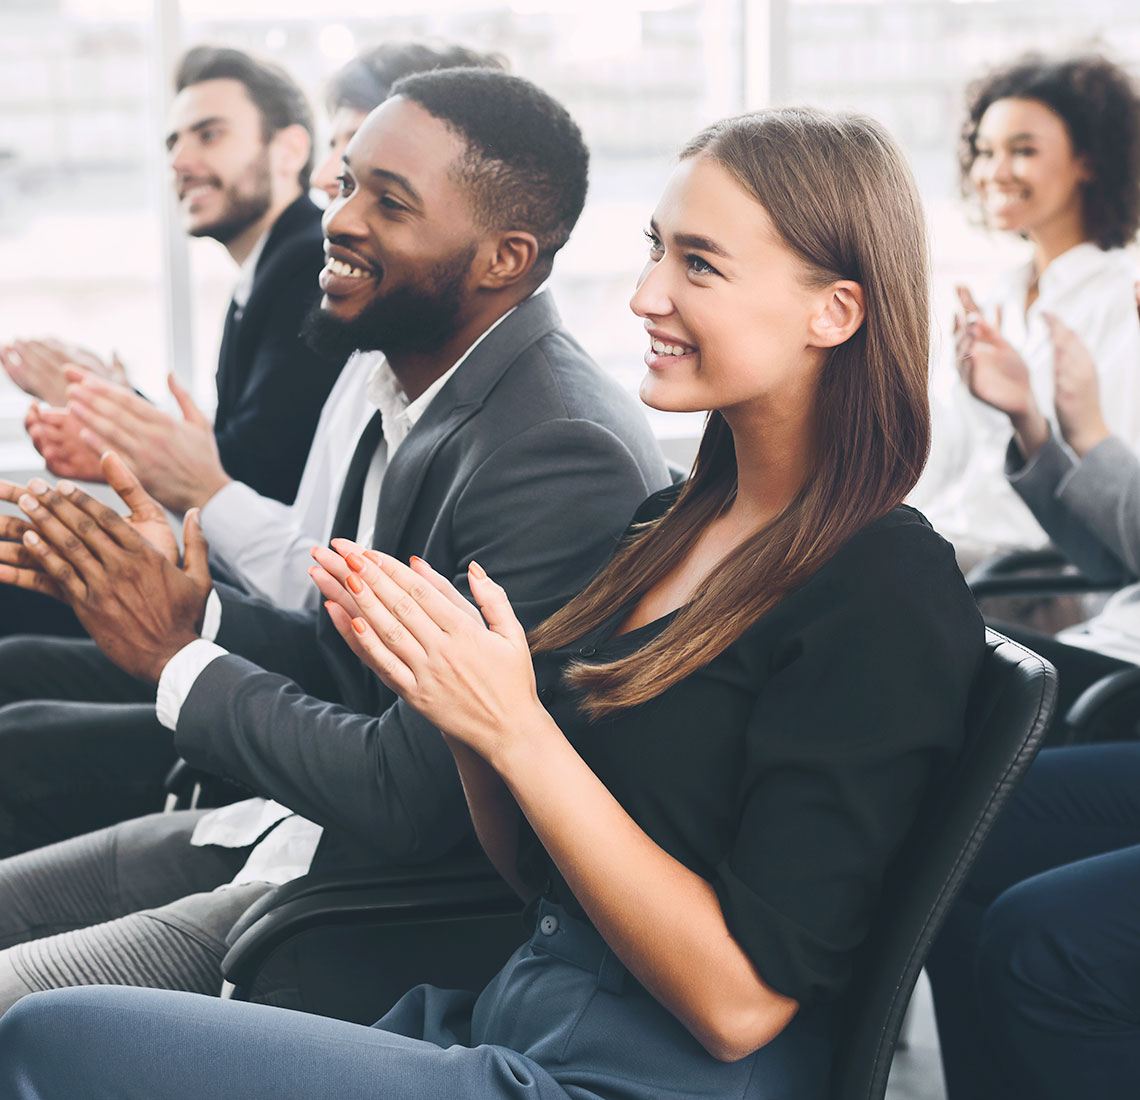 Engaging employees and encouraging feedback